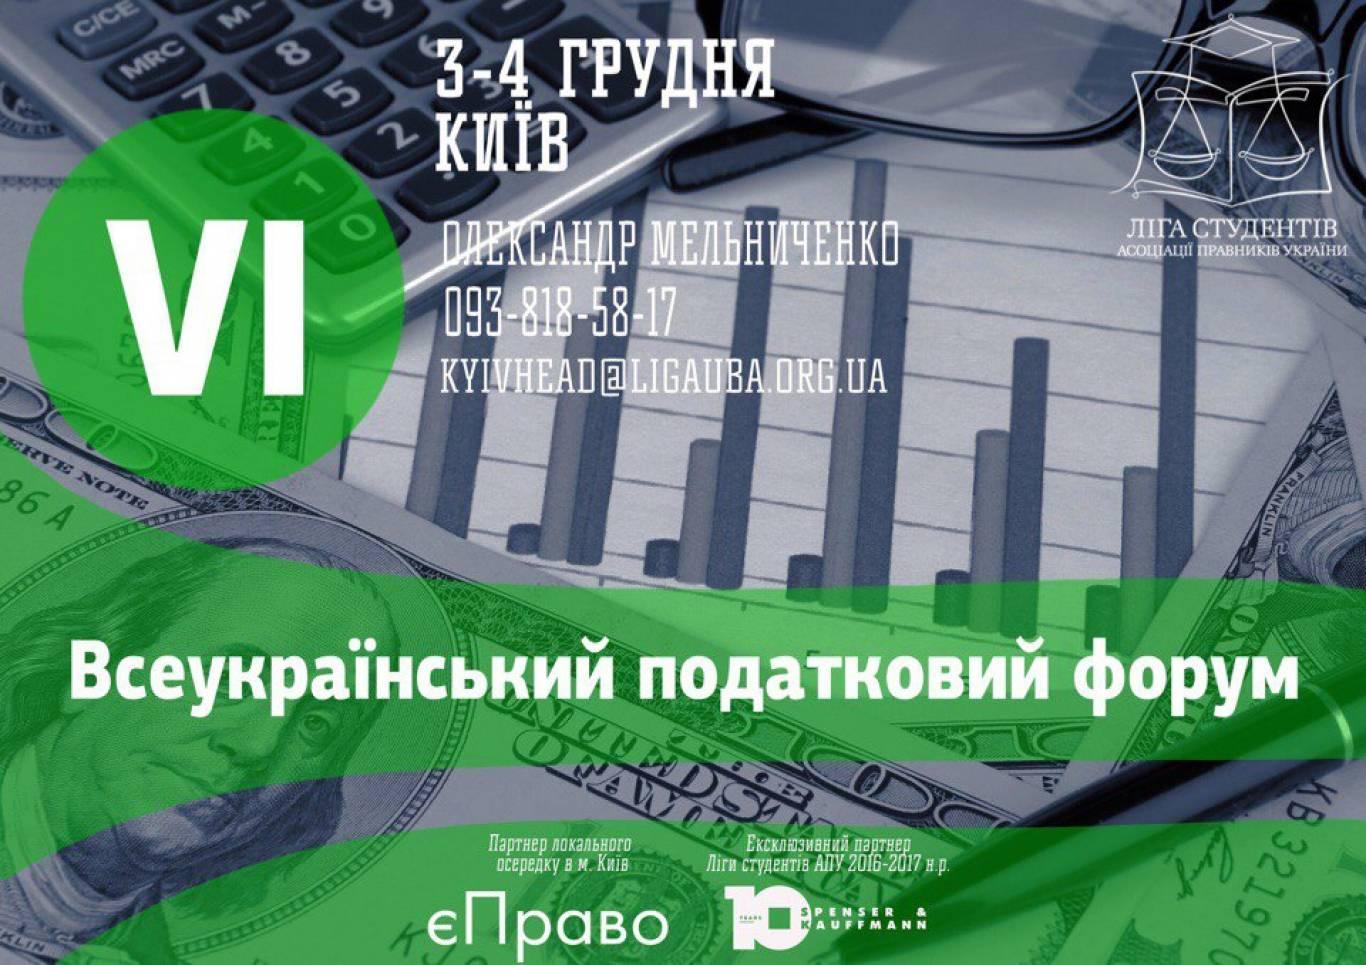 Всеукраїнський податковий форум